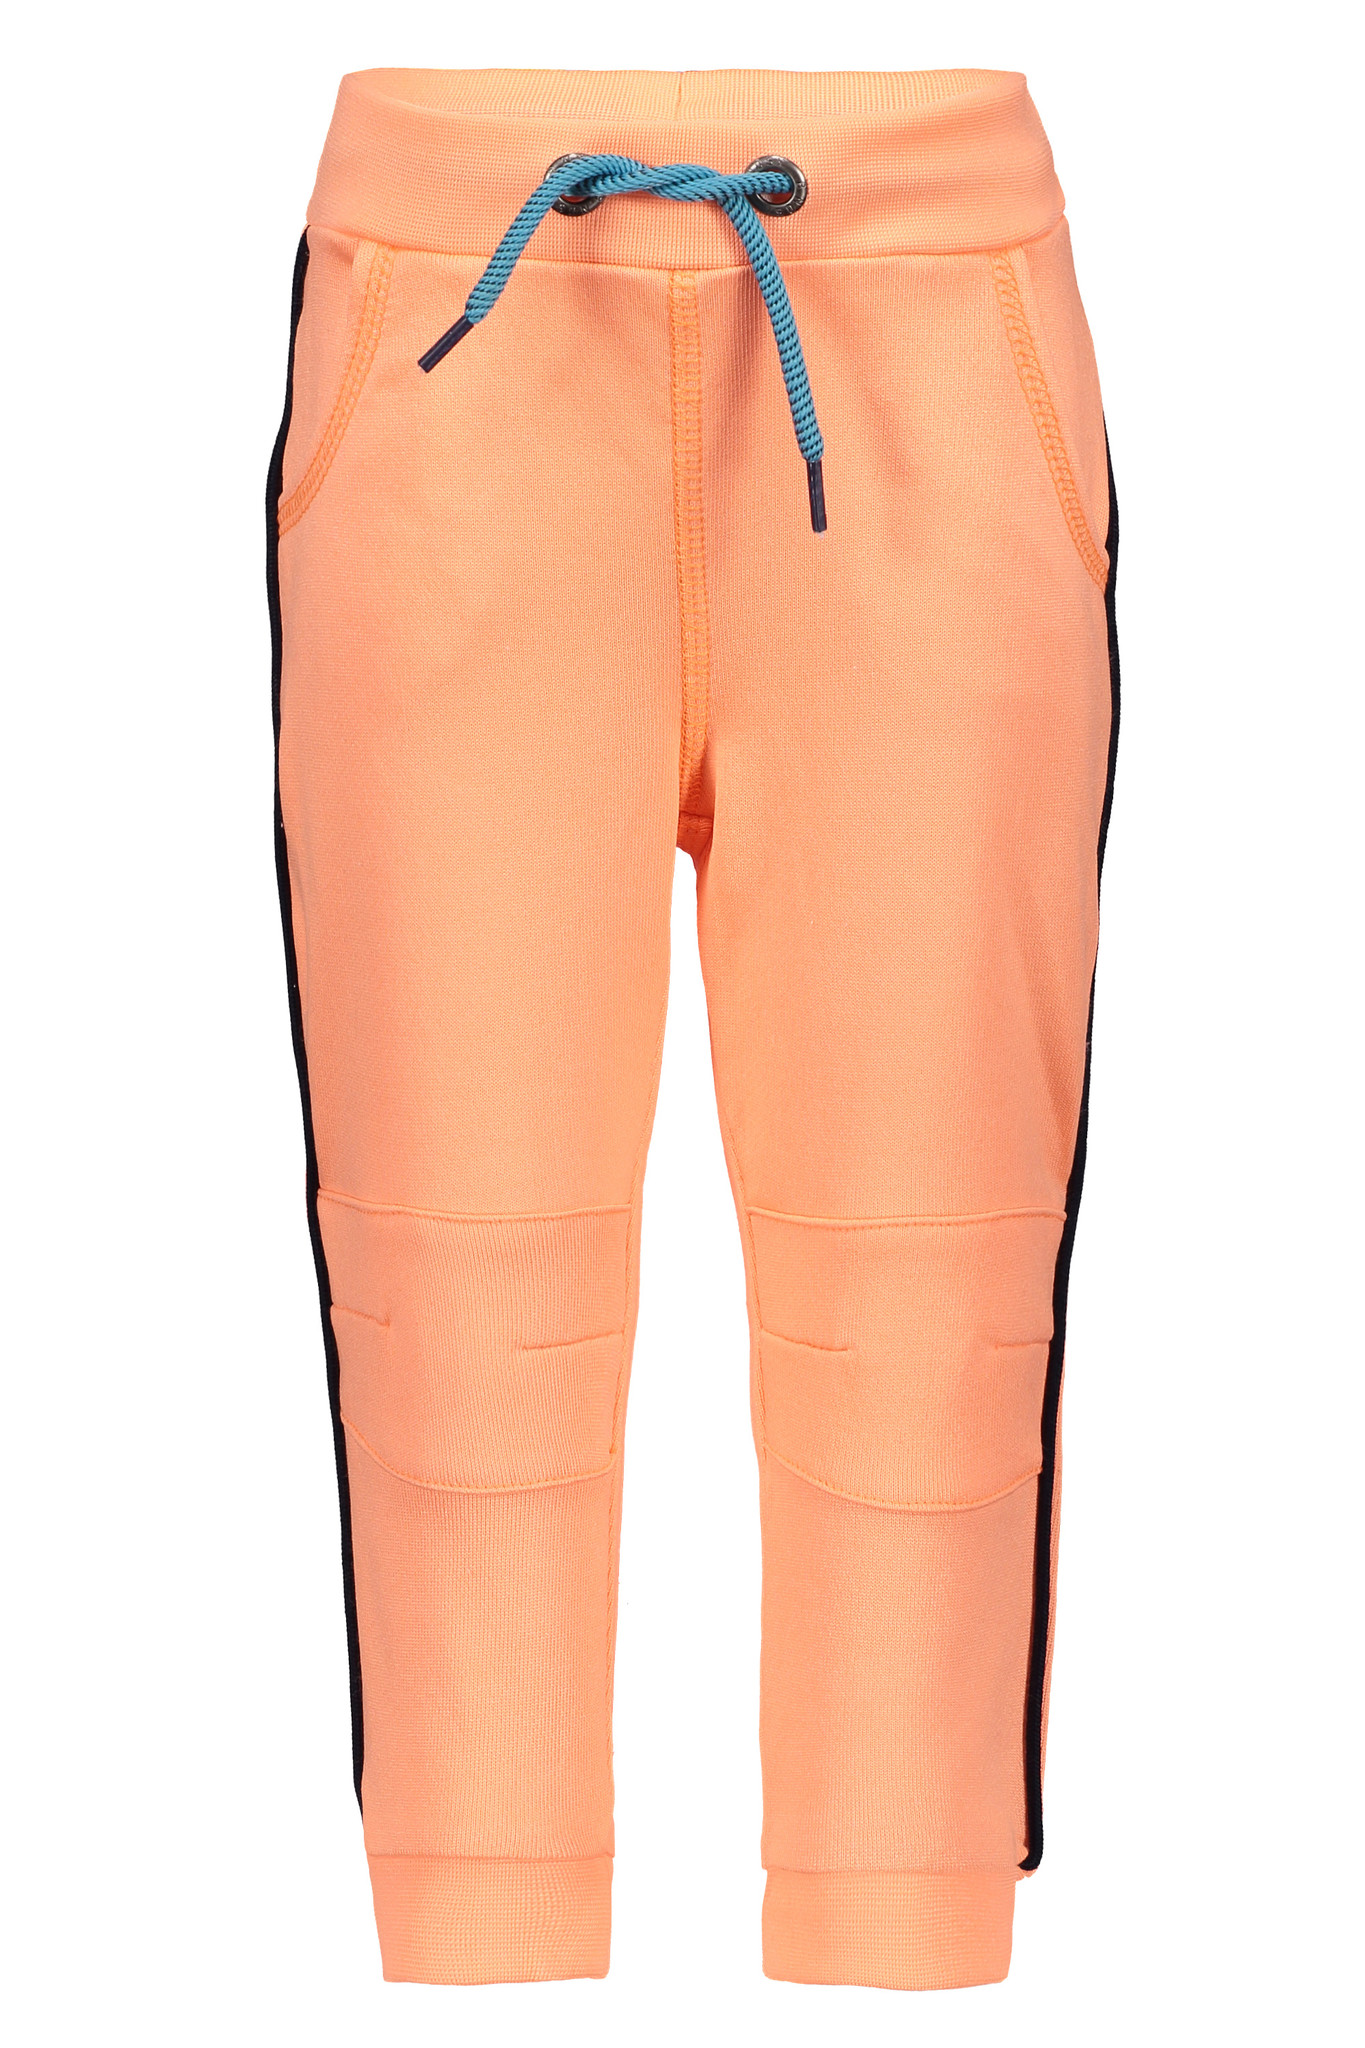 B.Nosy B.Nosy broekje neon orange